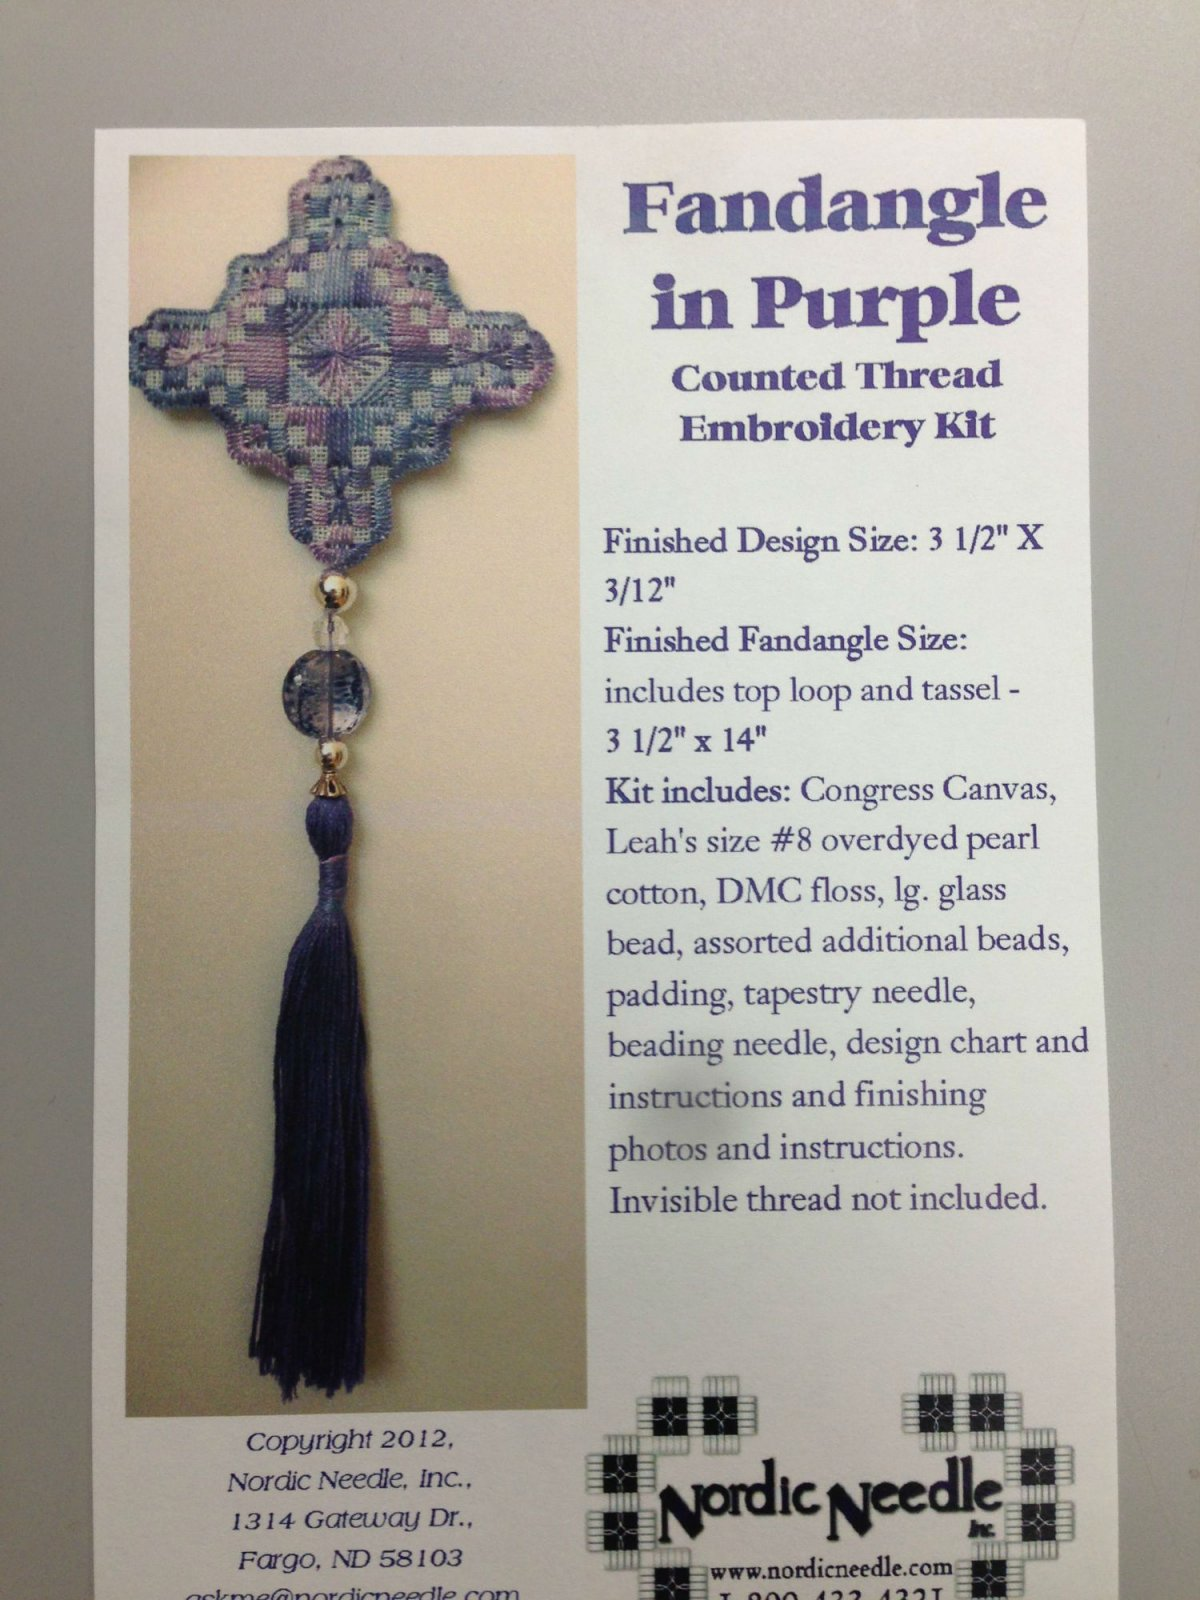 Nordic Needle Fandangle in Purple